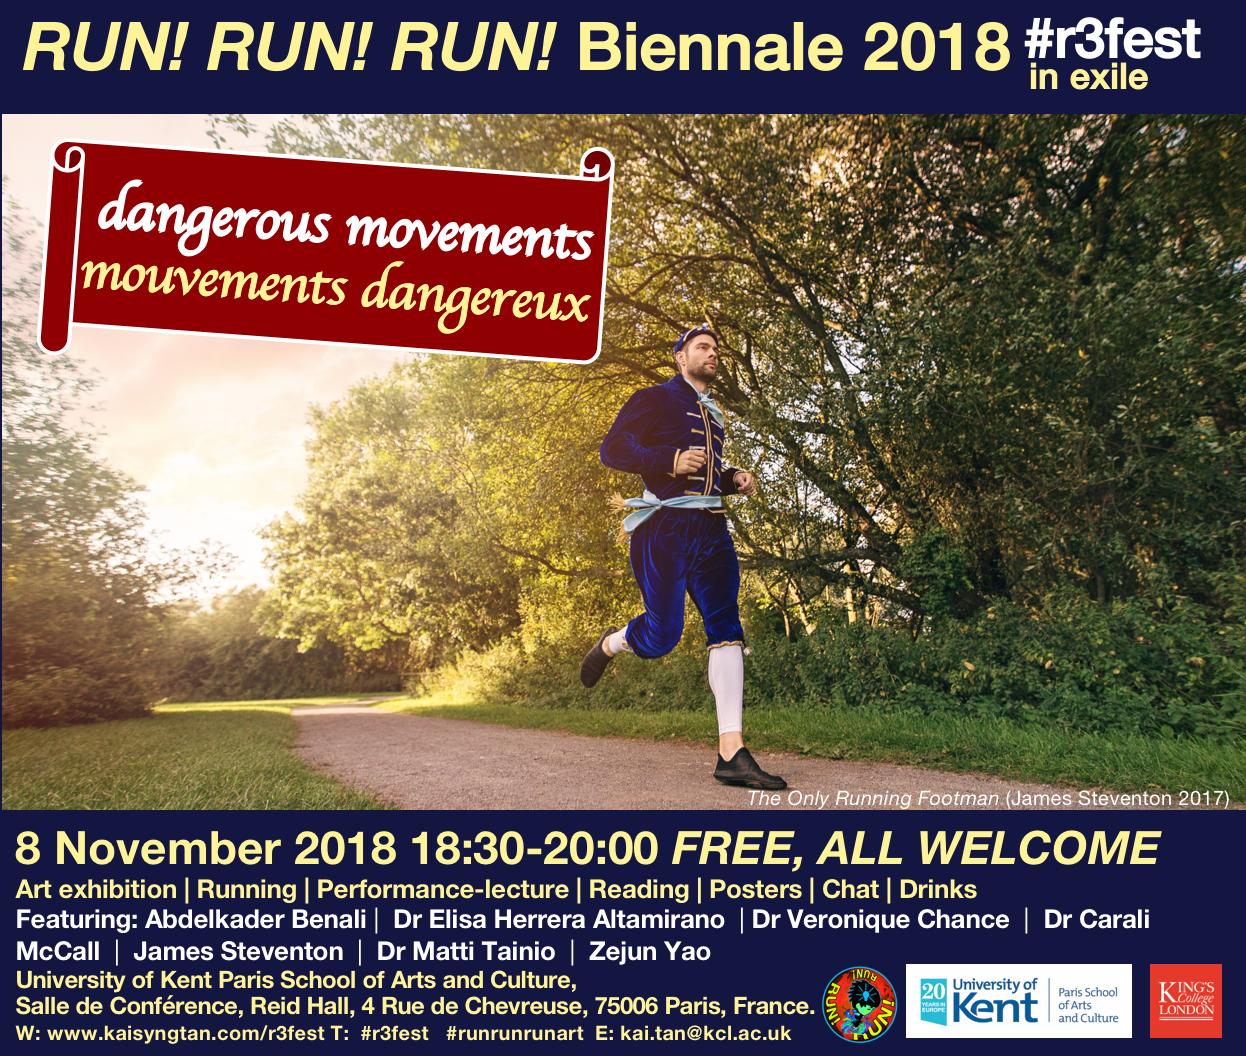 RUN RUN RUN Biennale